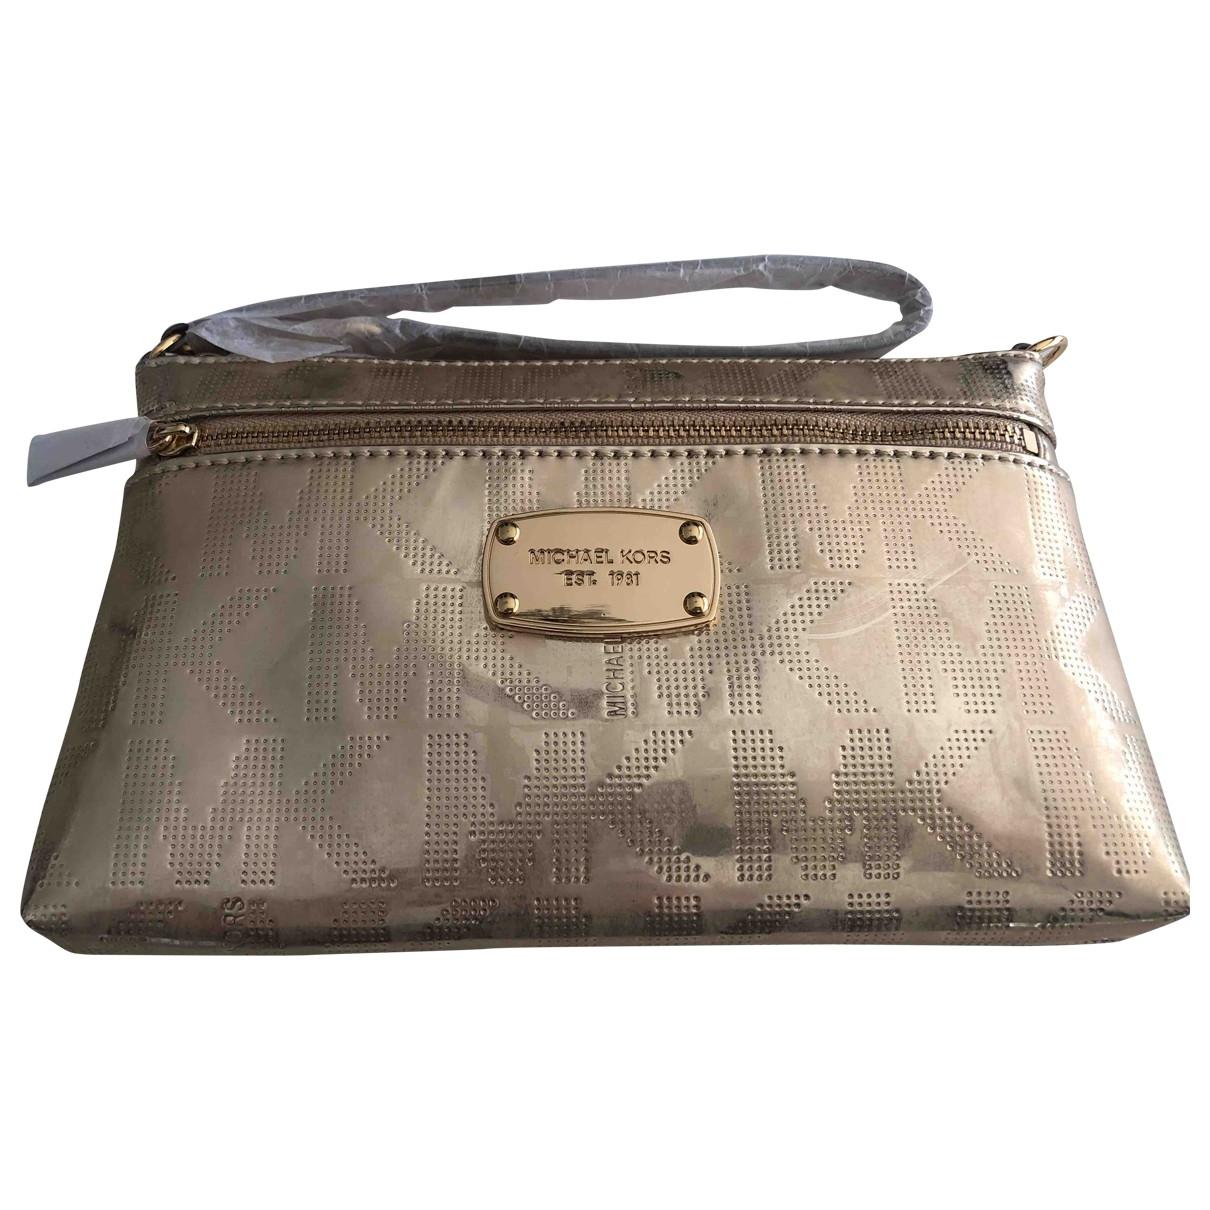 Michael Kors \N Gold Leather Travel bag for Women \N